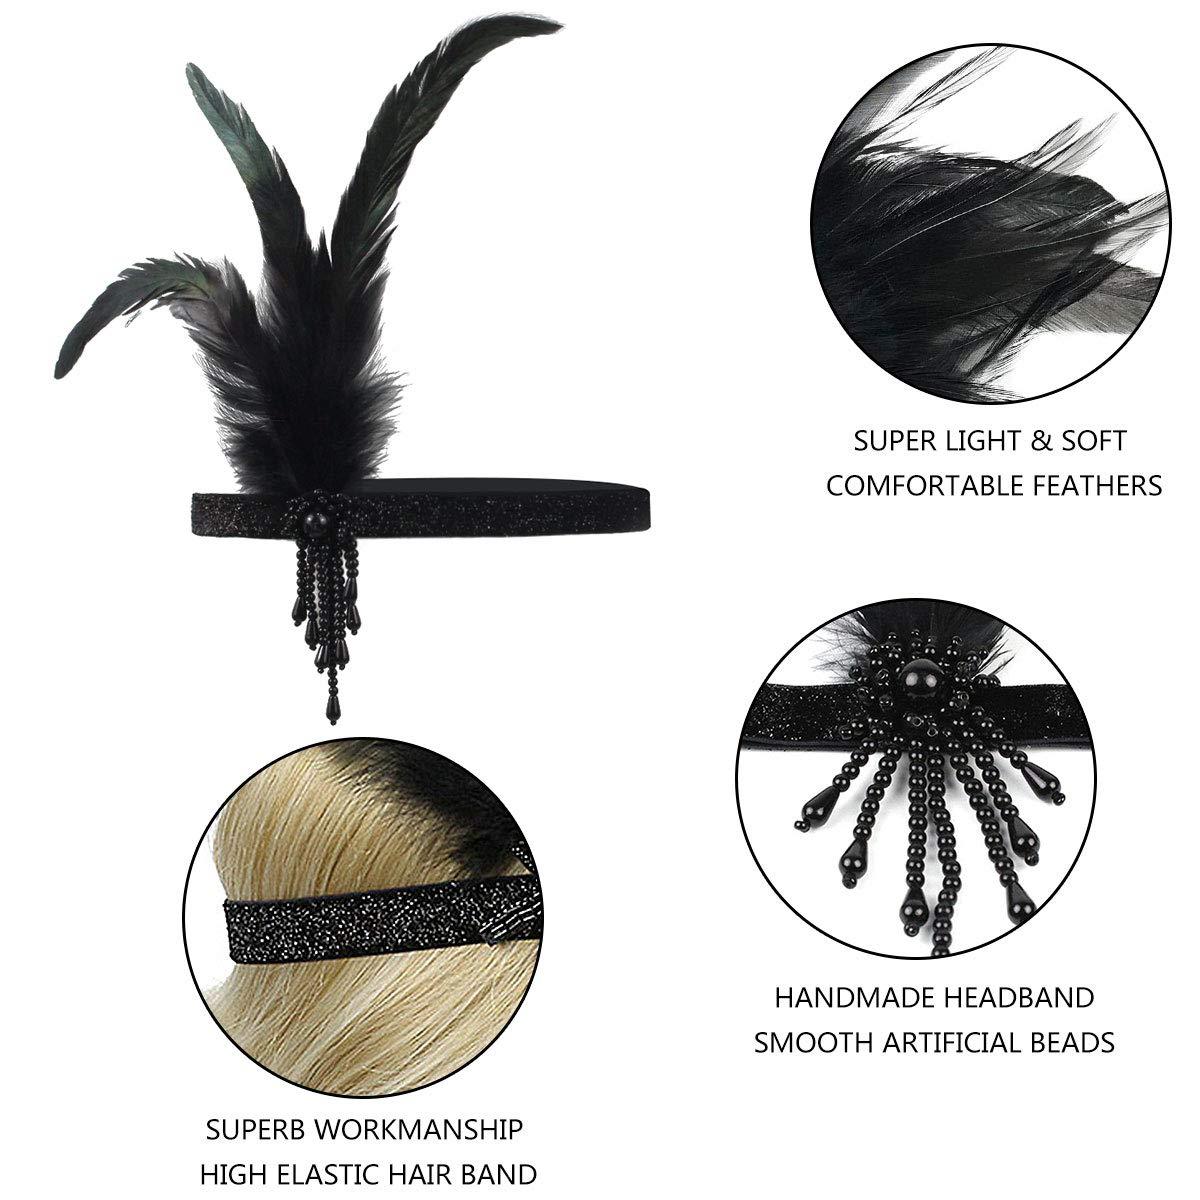 1920s Headband,1920s Headpiece KQueenStar 1920s Flapper Headpiece,1920s Feather Headband Flapper Vintage 1920 Accessories